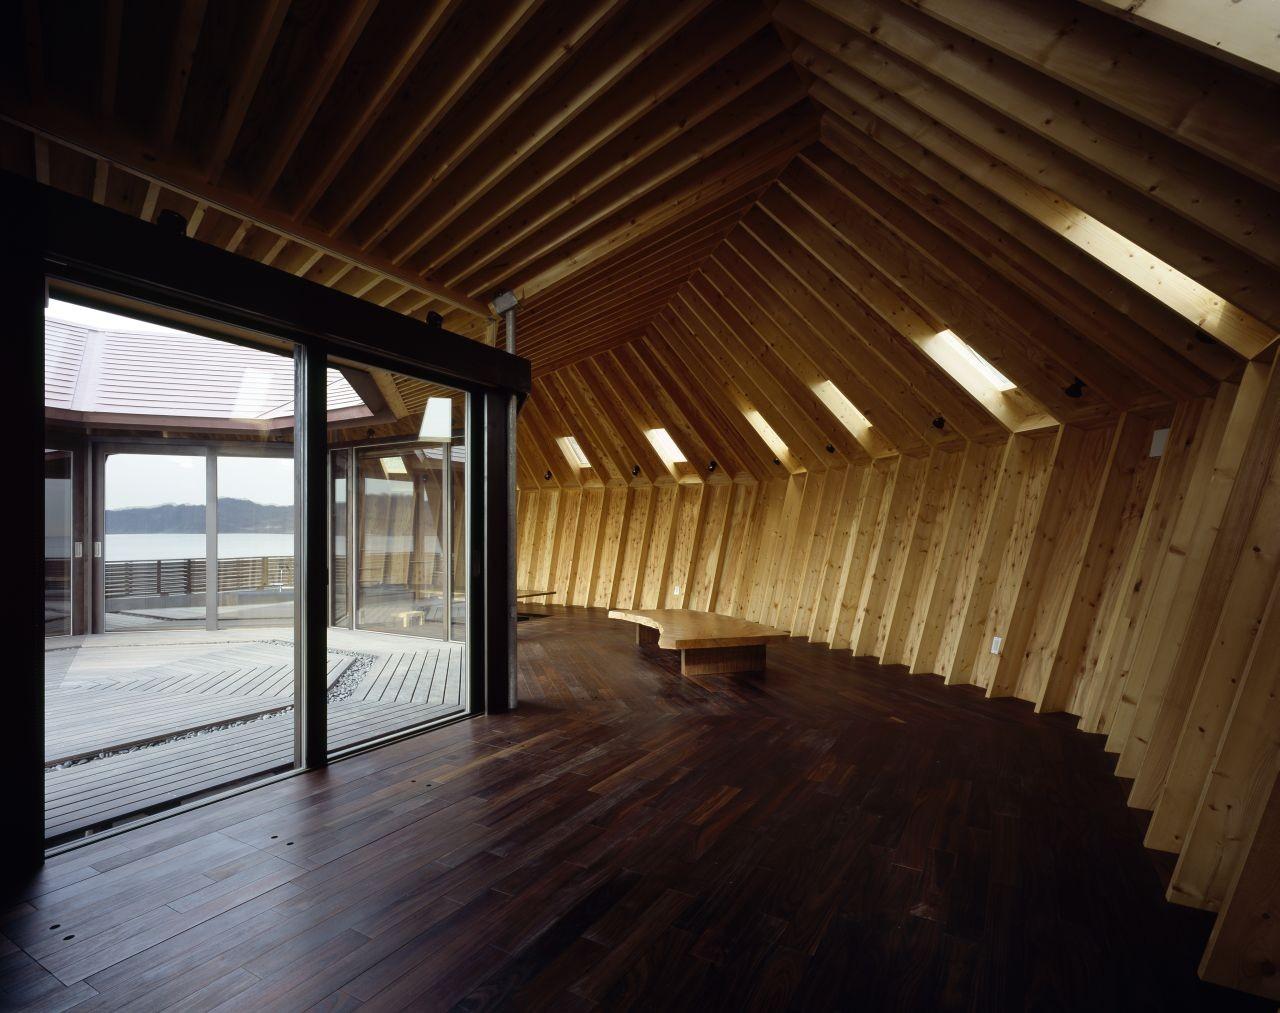 japanese shell house interior photo - 5